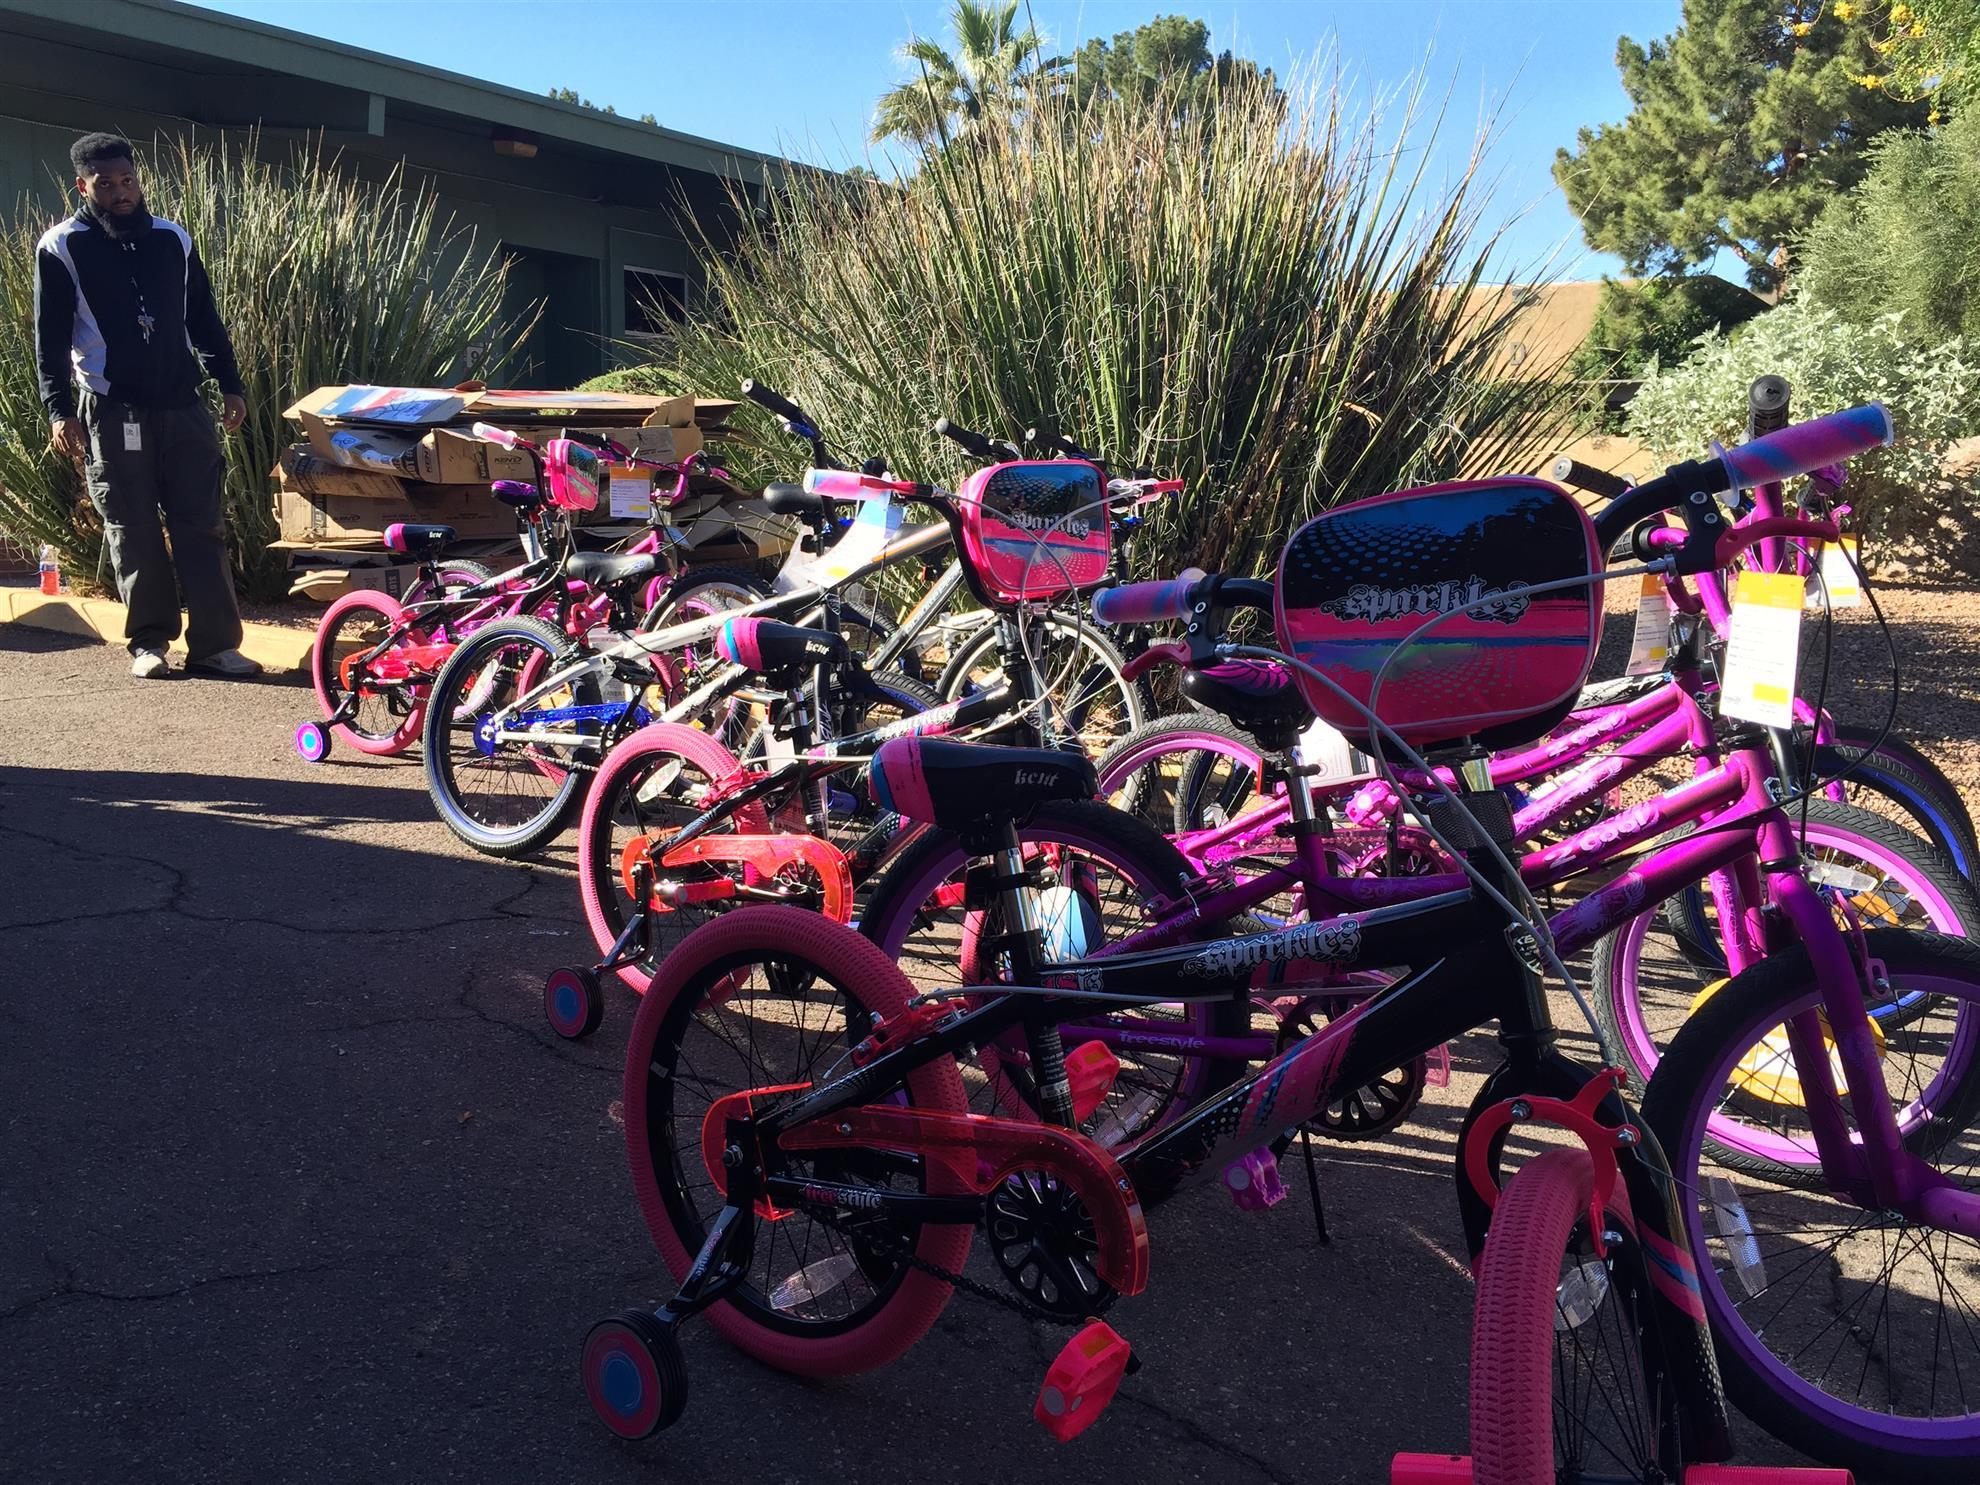 SSRC - Bike Project 2016 | Rotary Club of Scottsdale Sunrise